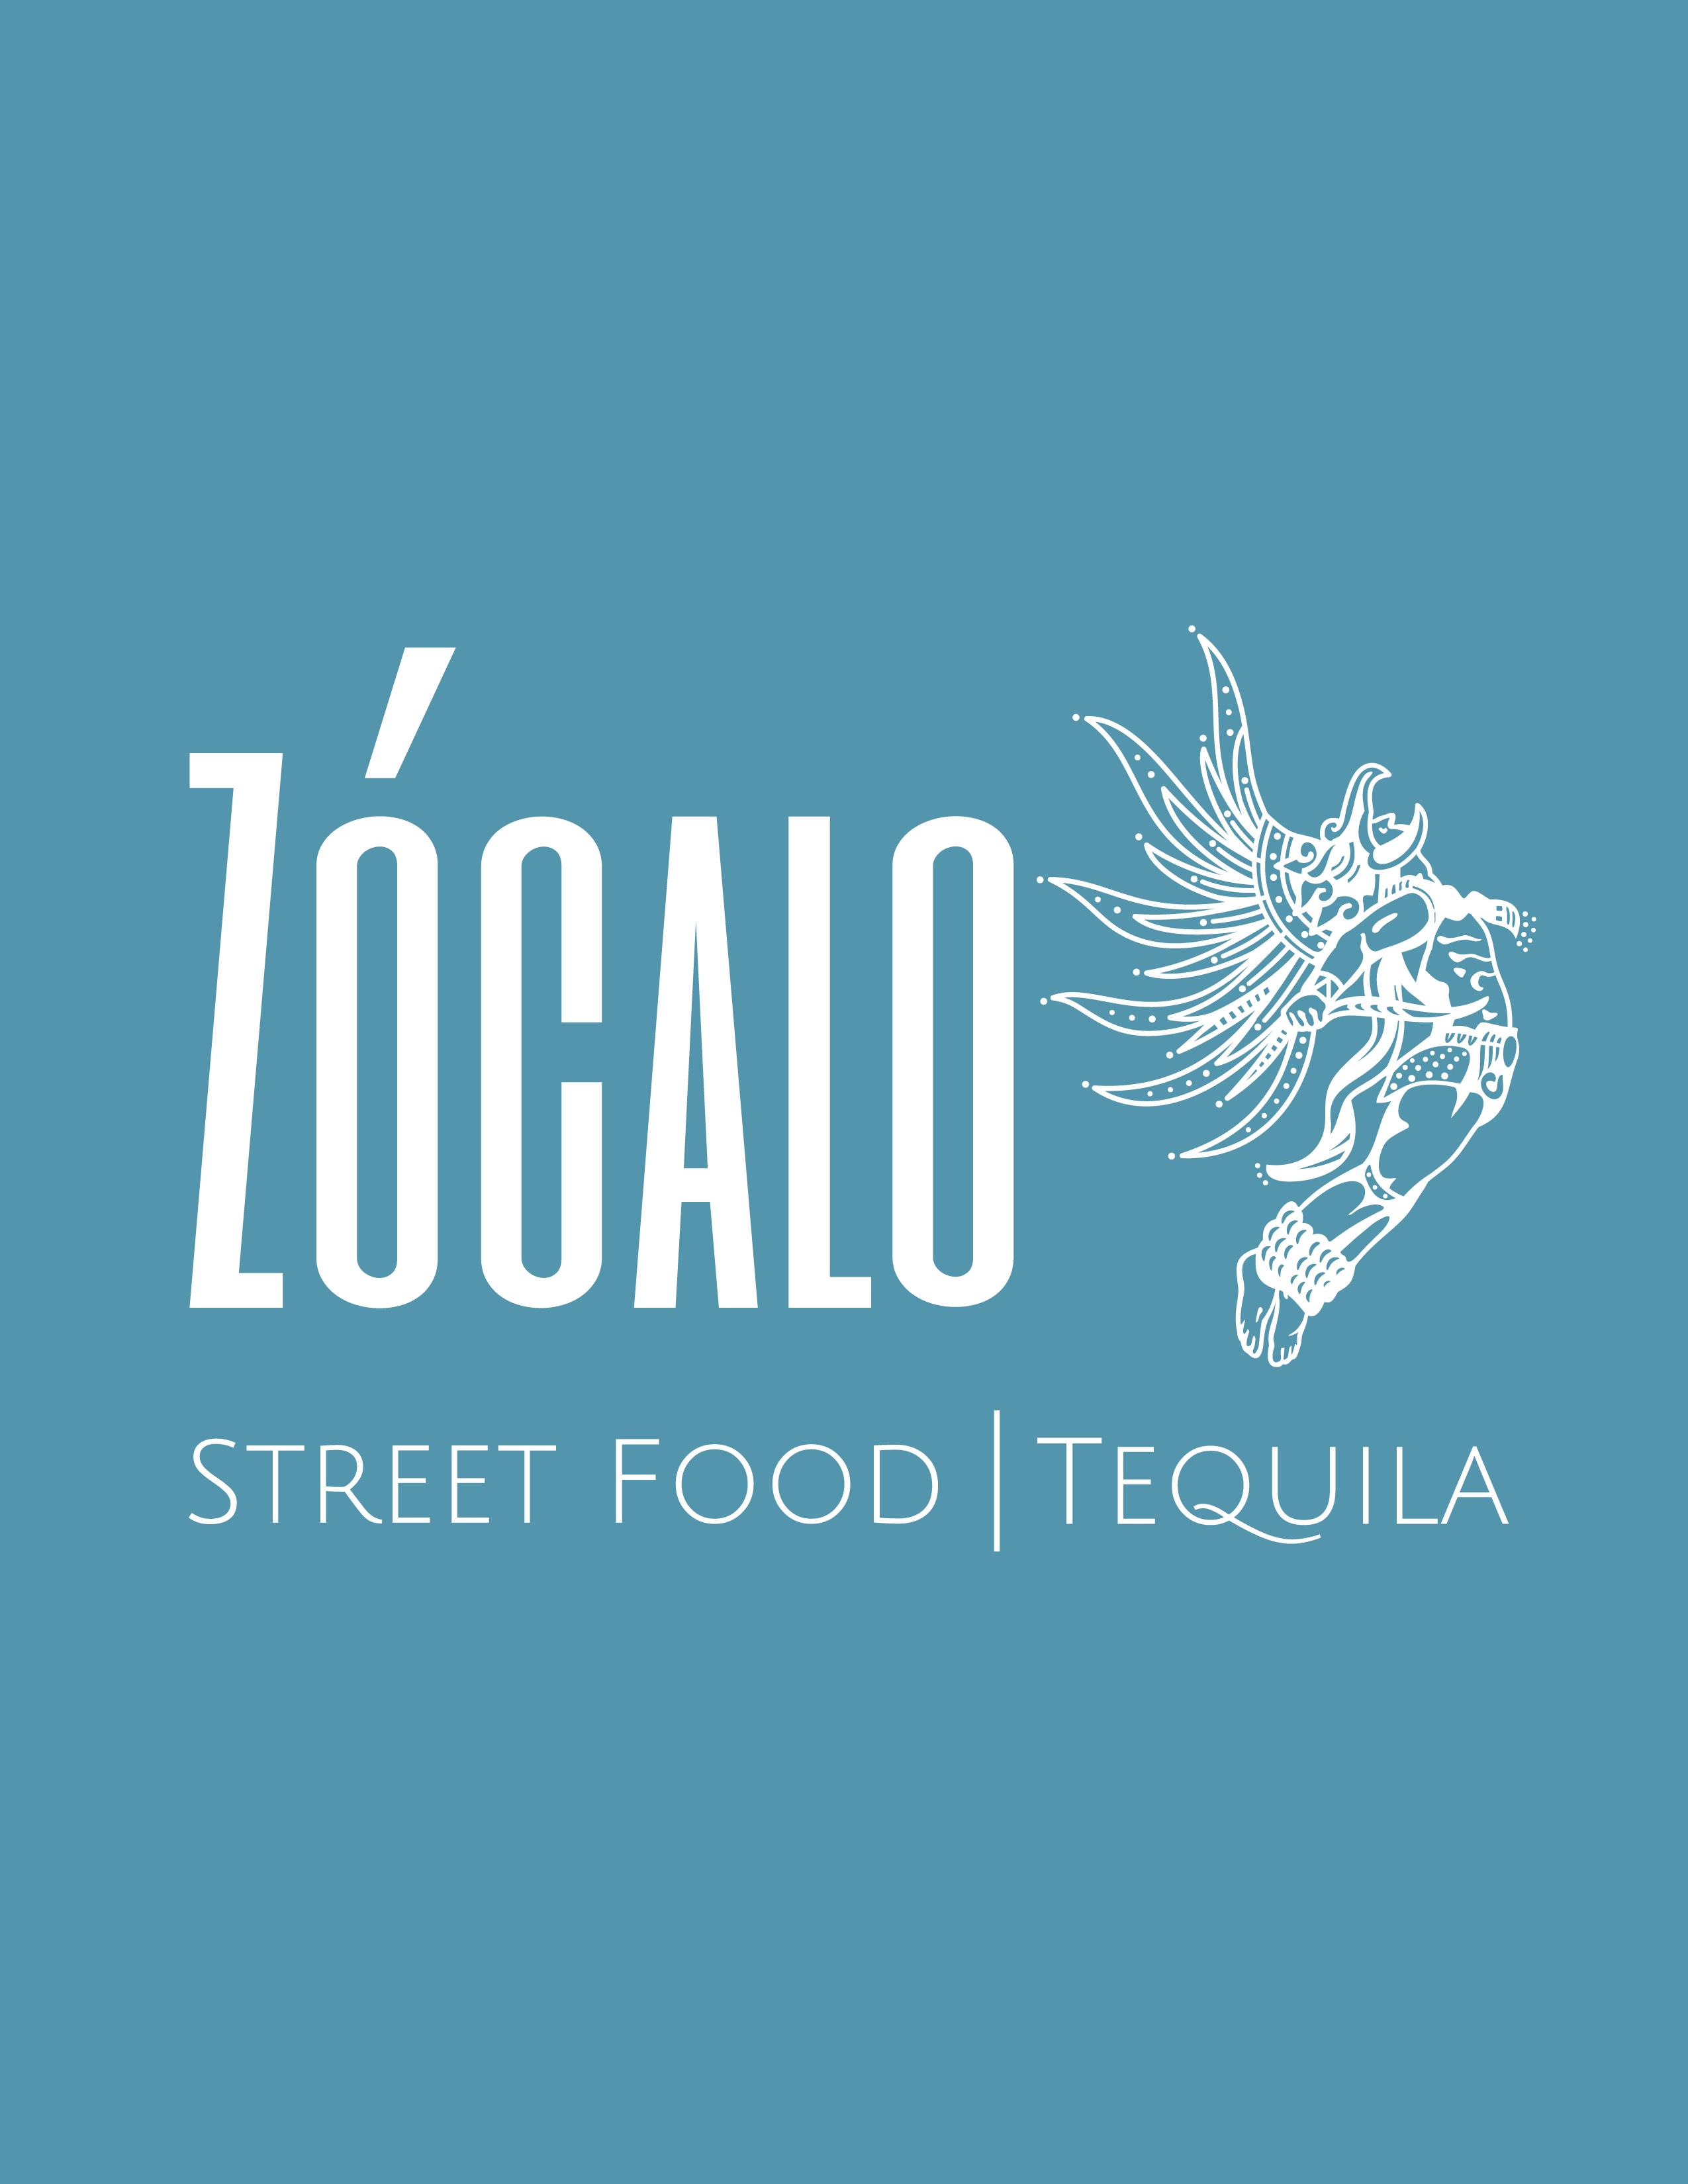 Zocalo Street Food